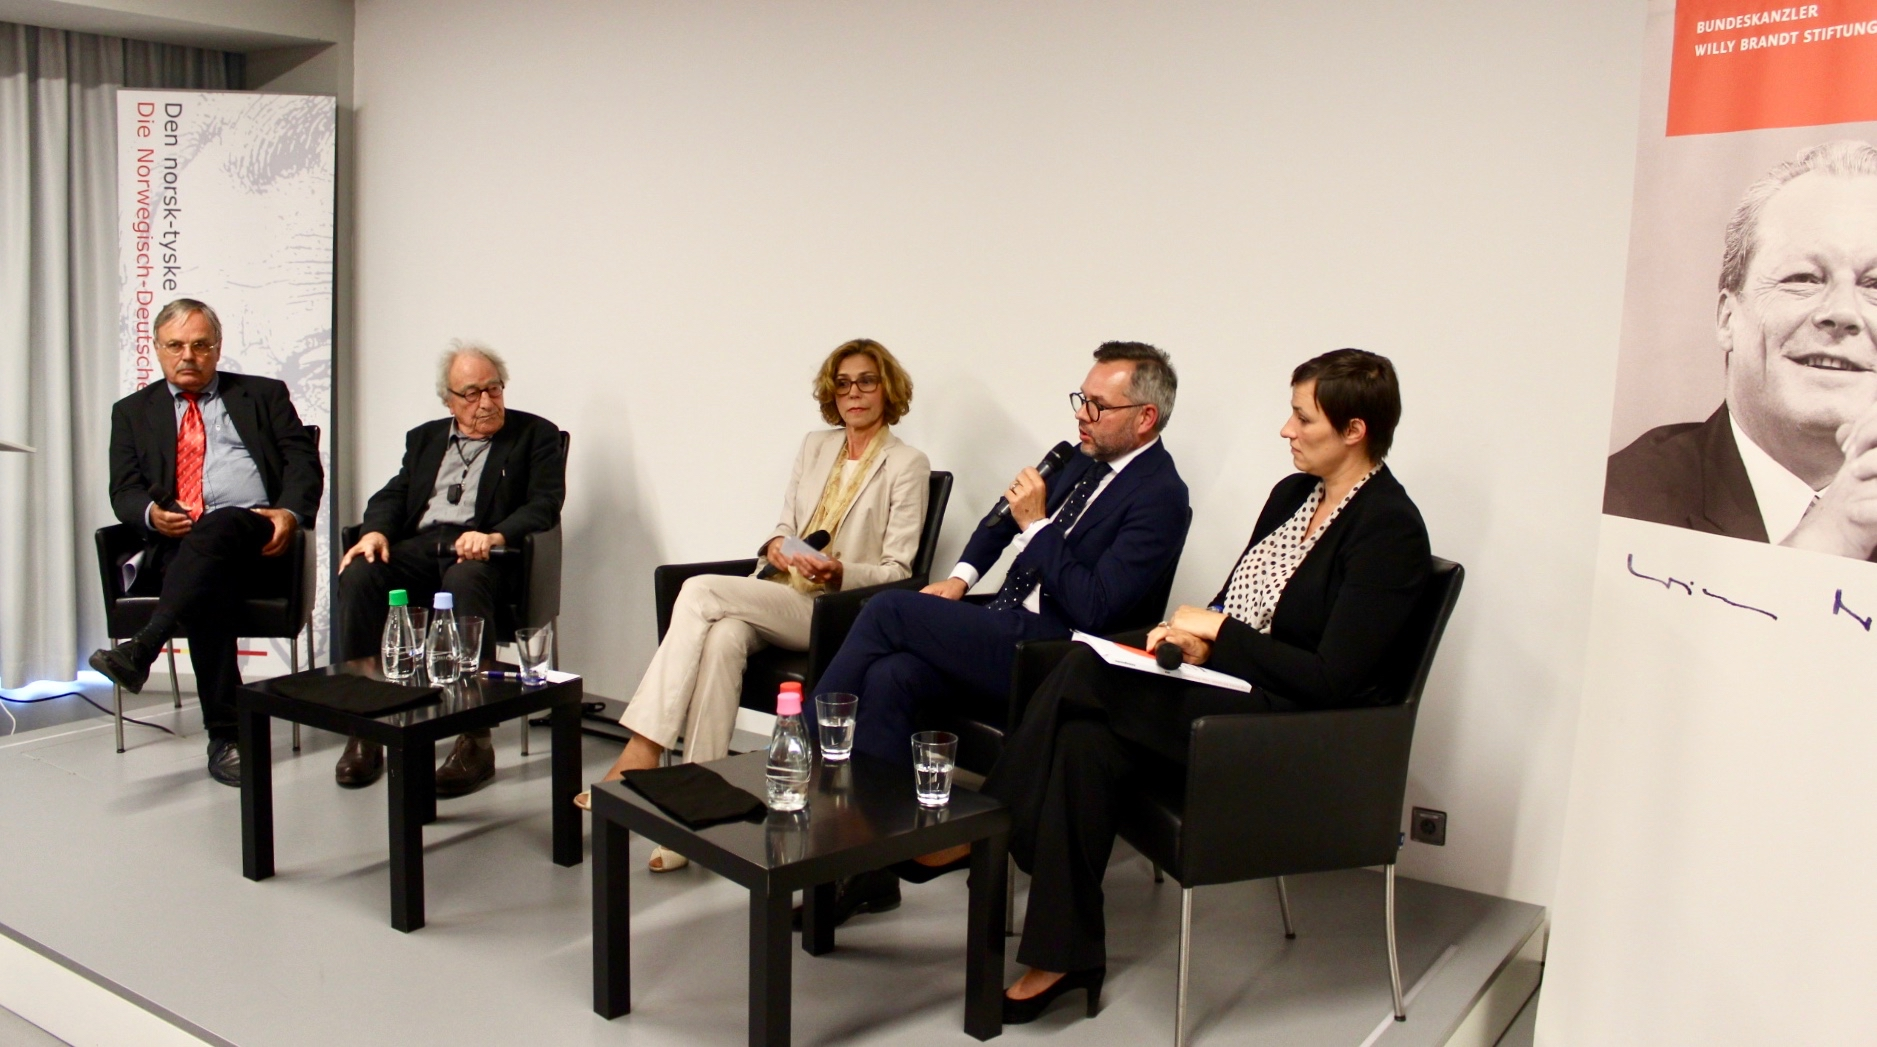 V.l.: Wolfgang Biermann, Peter Merseburger, Jutta Falkner, Michael Roth, Nicole Deithoff@Bundeskanzler-Willy-Brandt-Stiftung